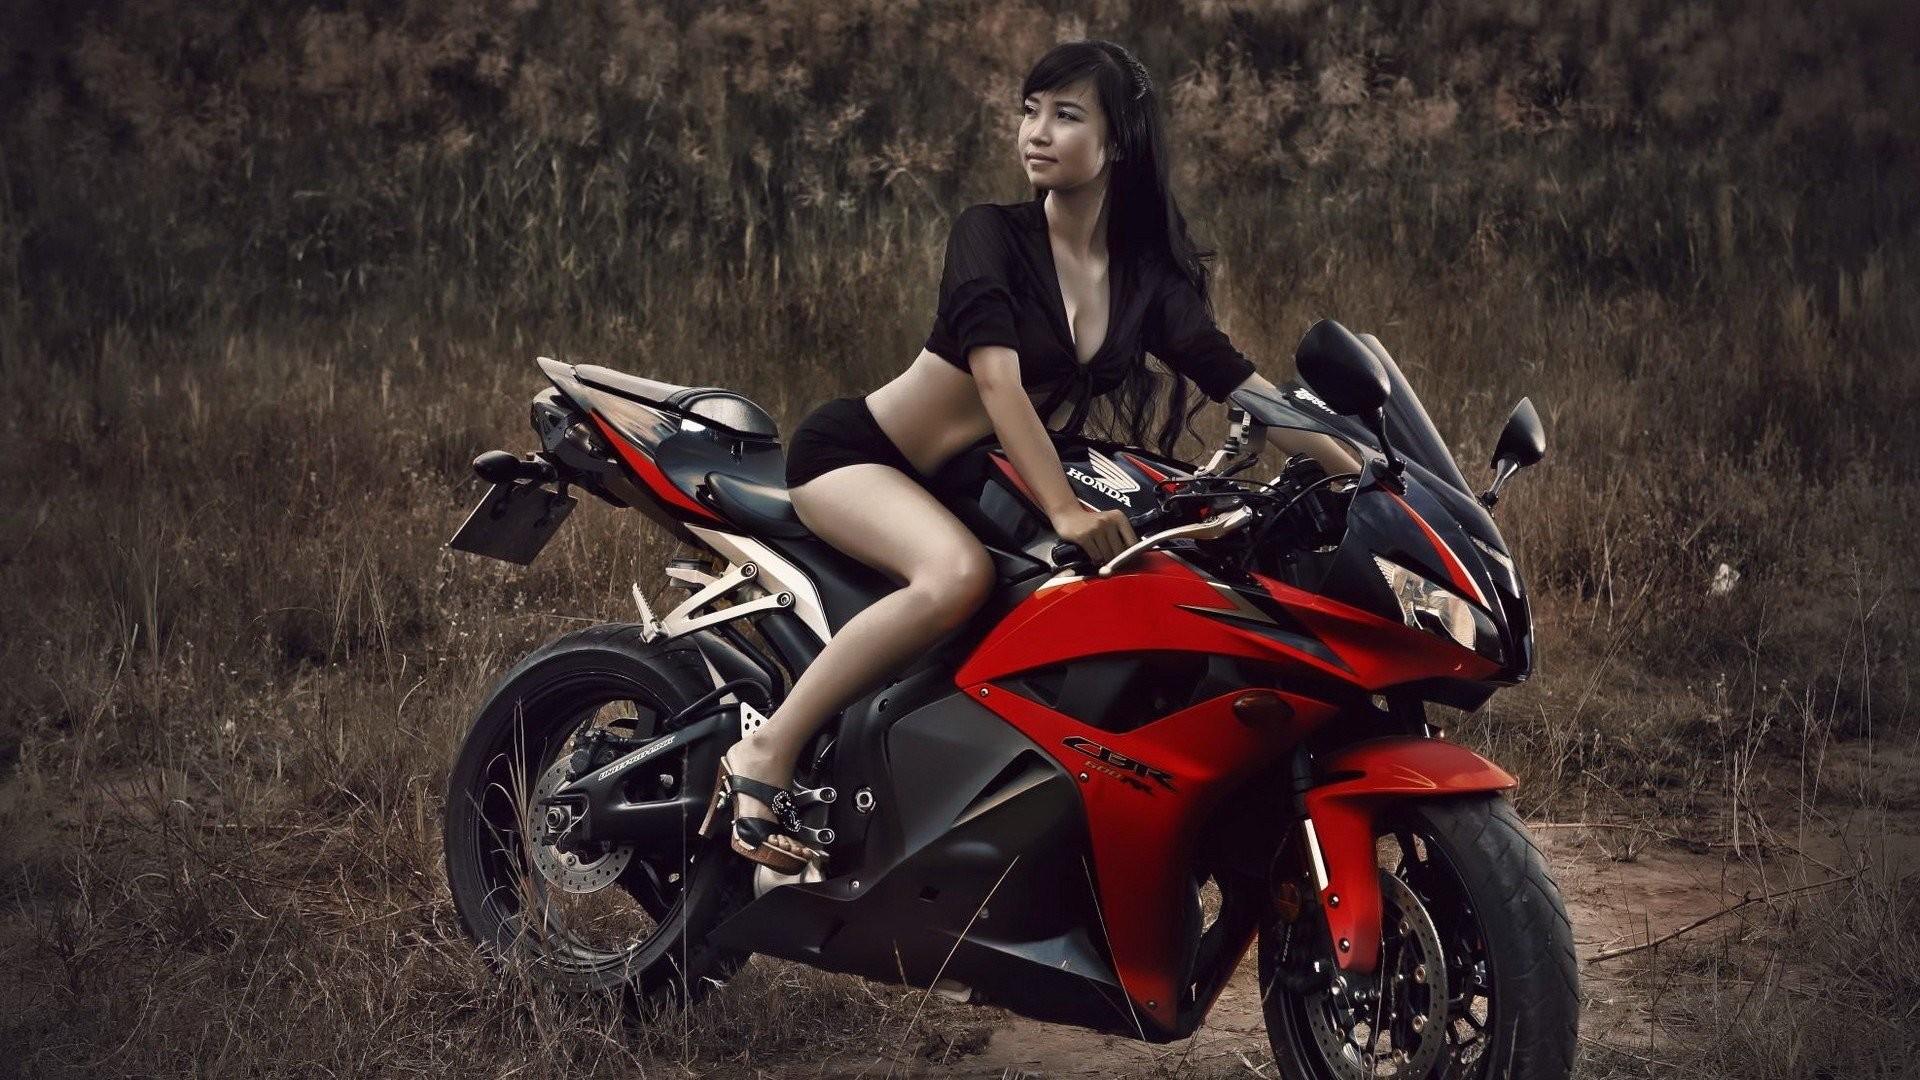 Motorcycle Girl Wallpaper: Chopper Girls Motorcycle Wallpaper (73+ Images